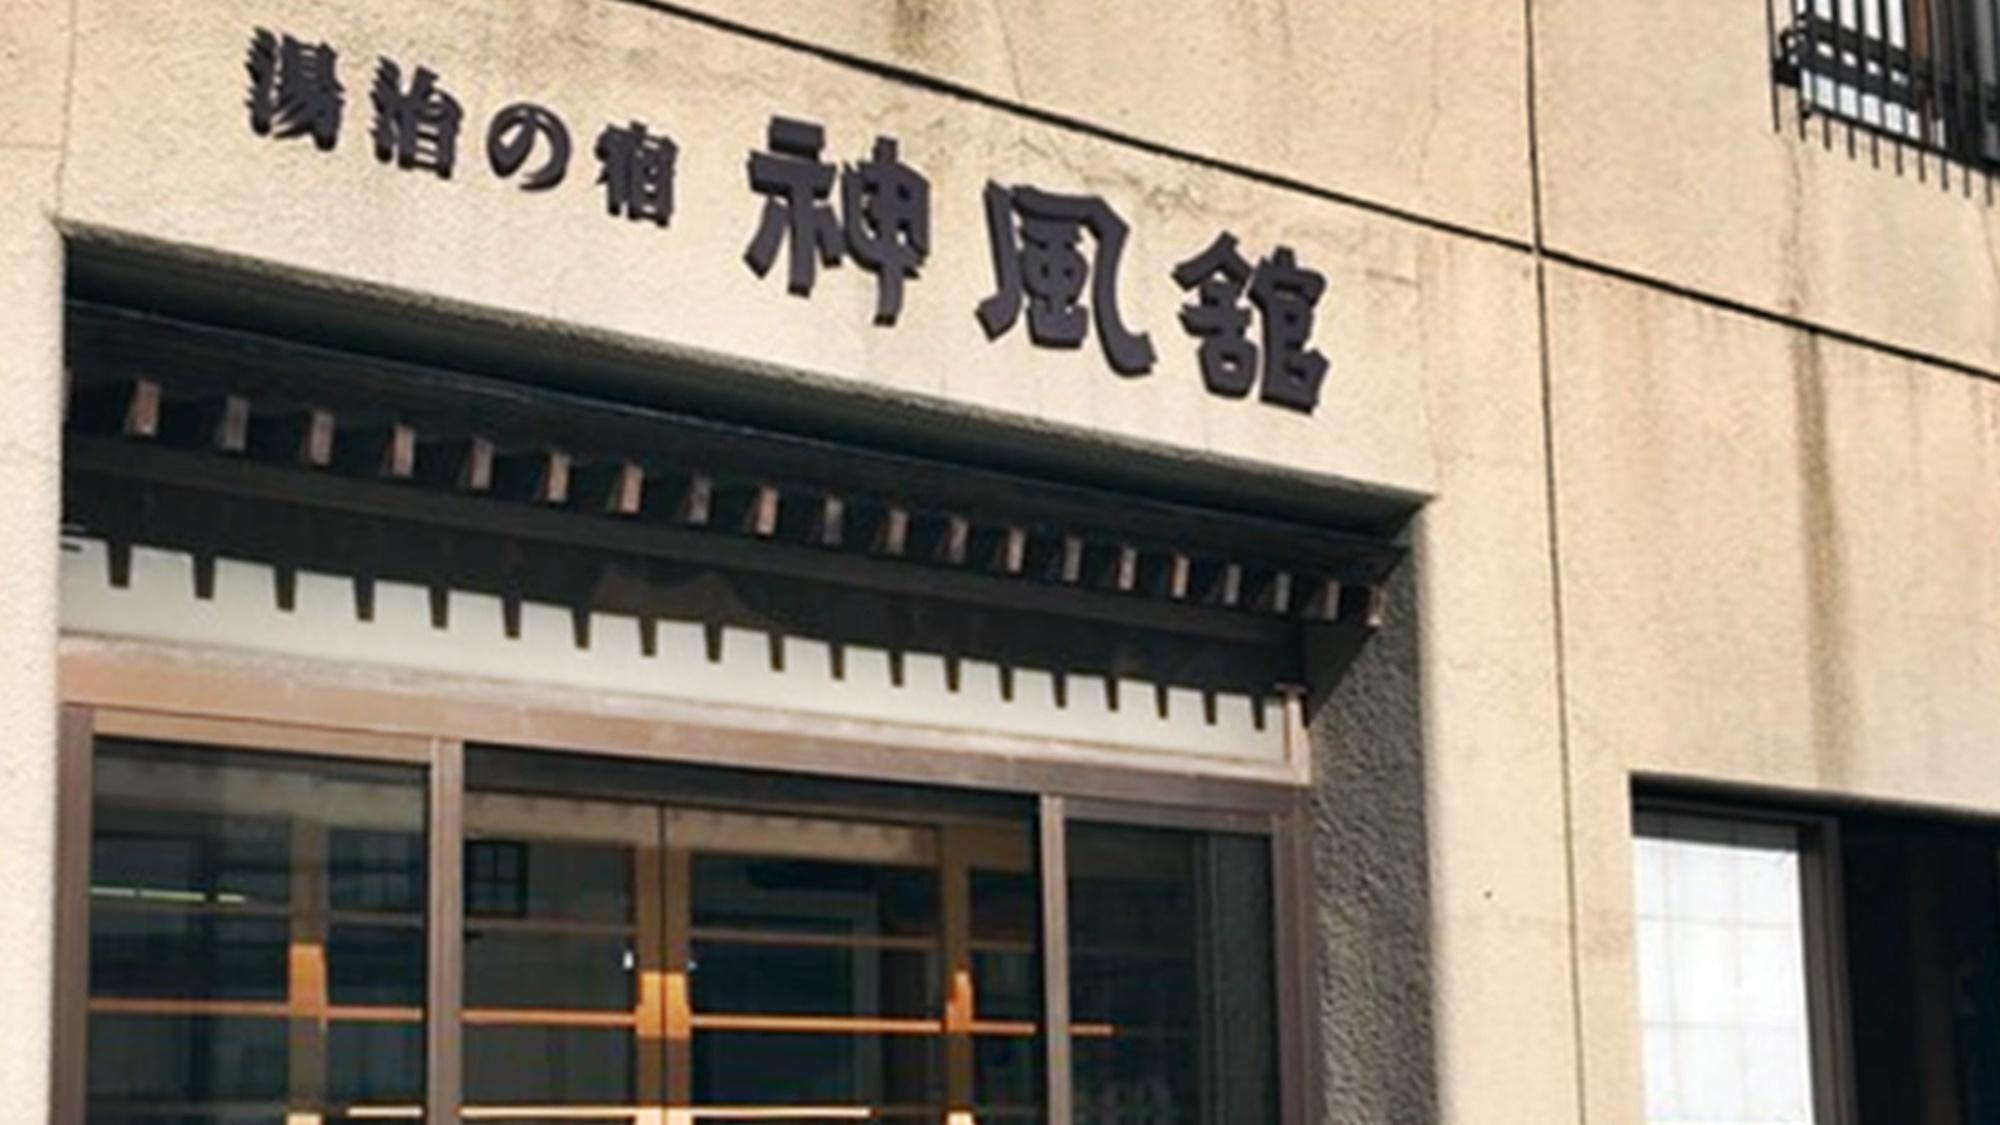 栃尾又温泉 湯治の宿 神風館新潟県